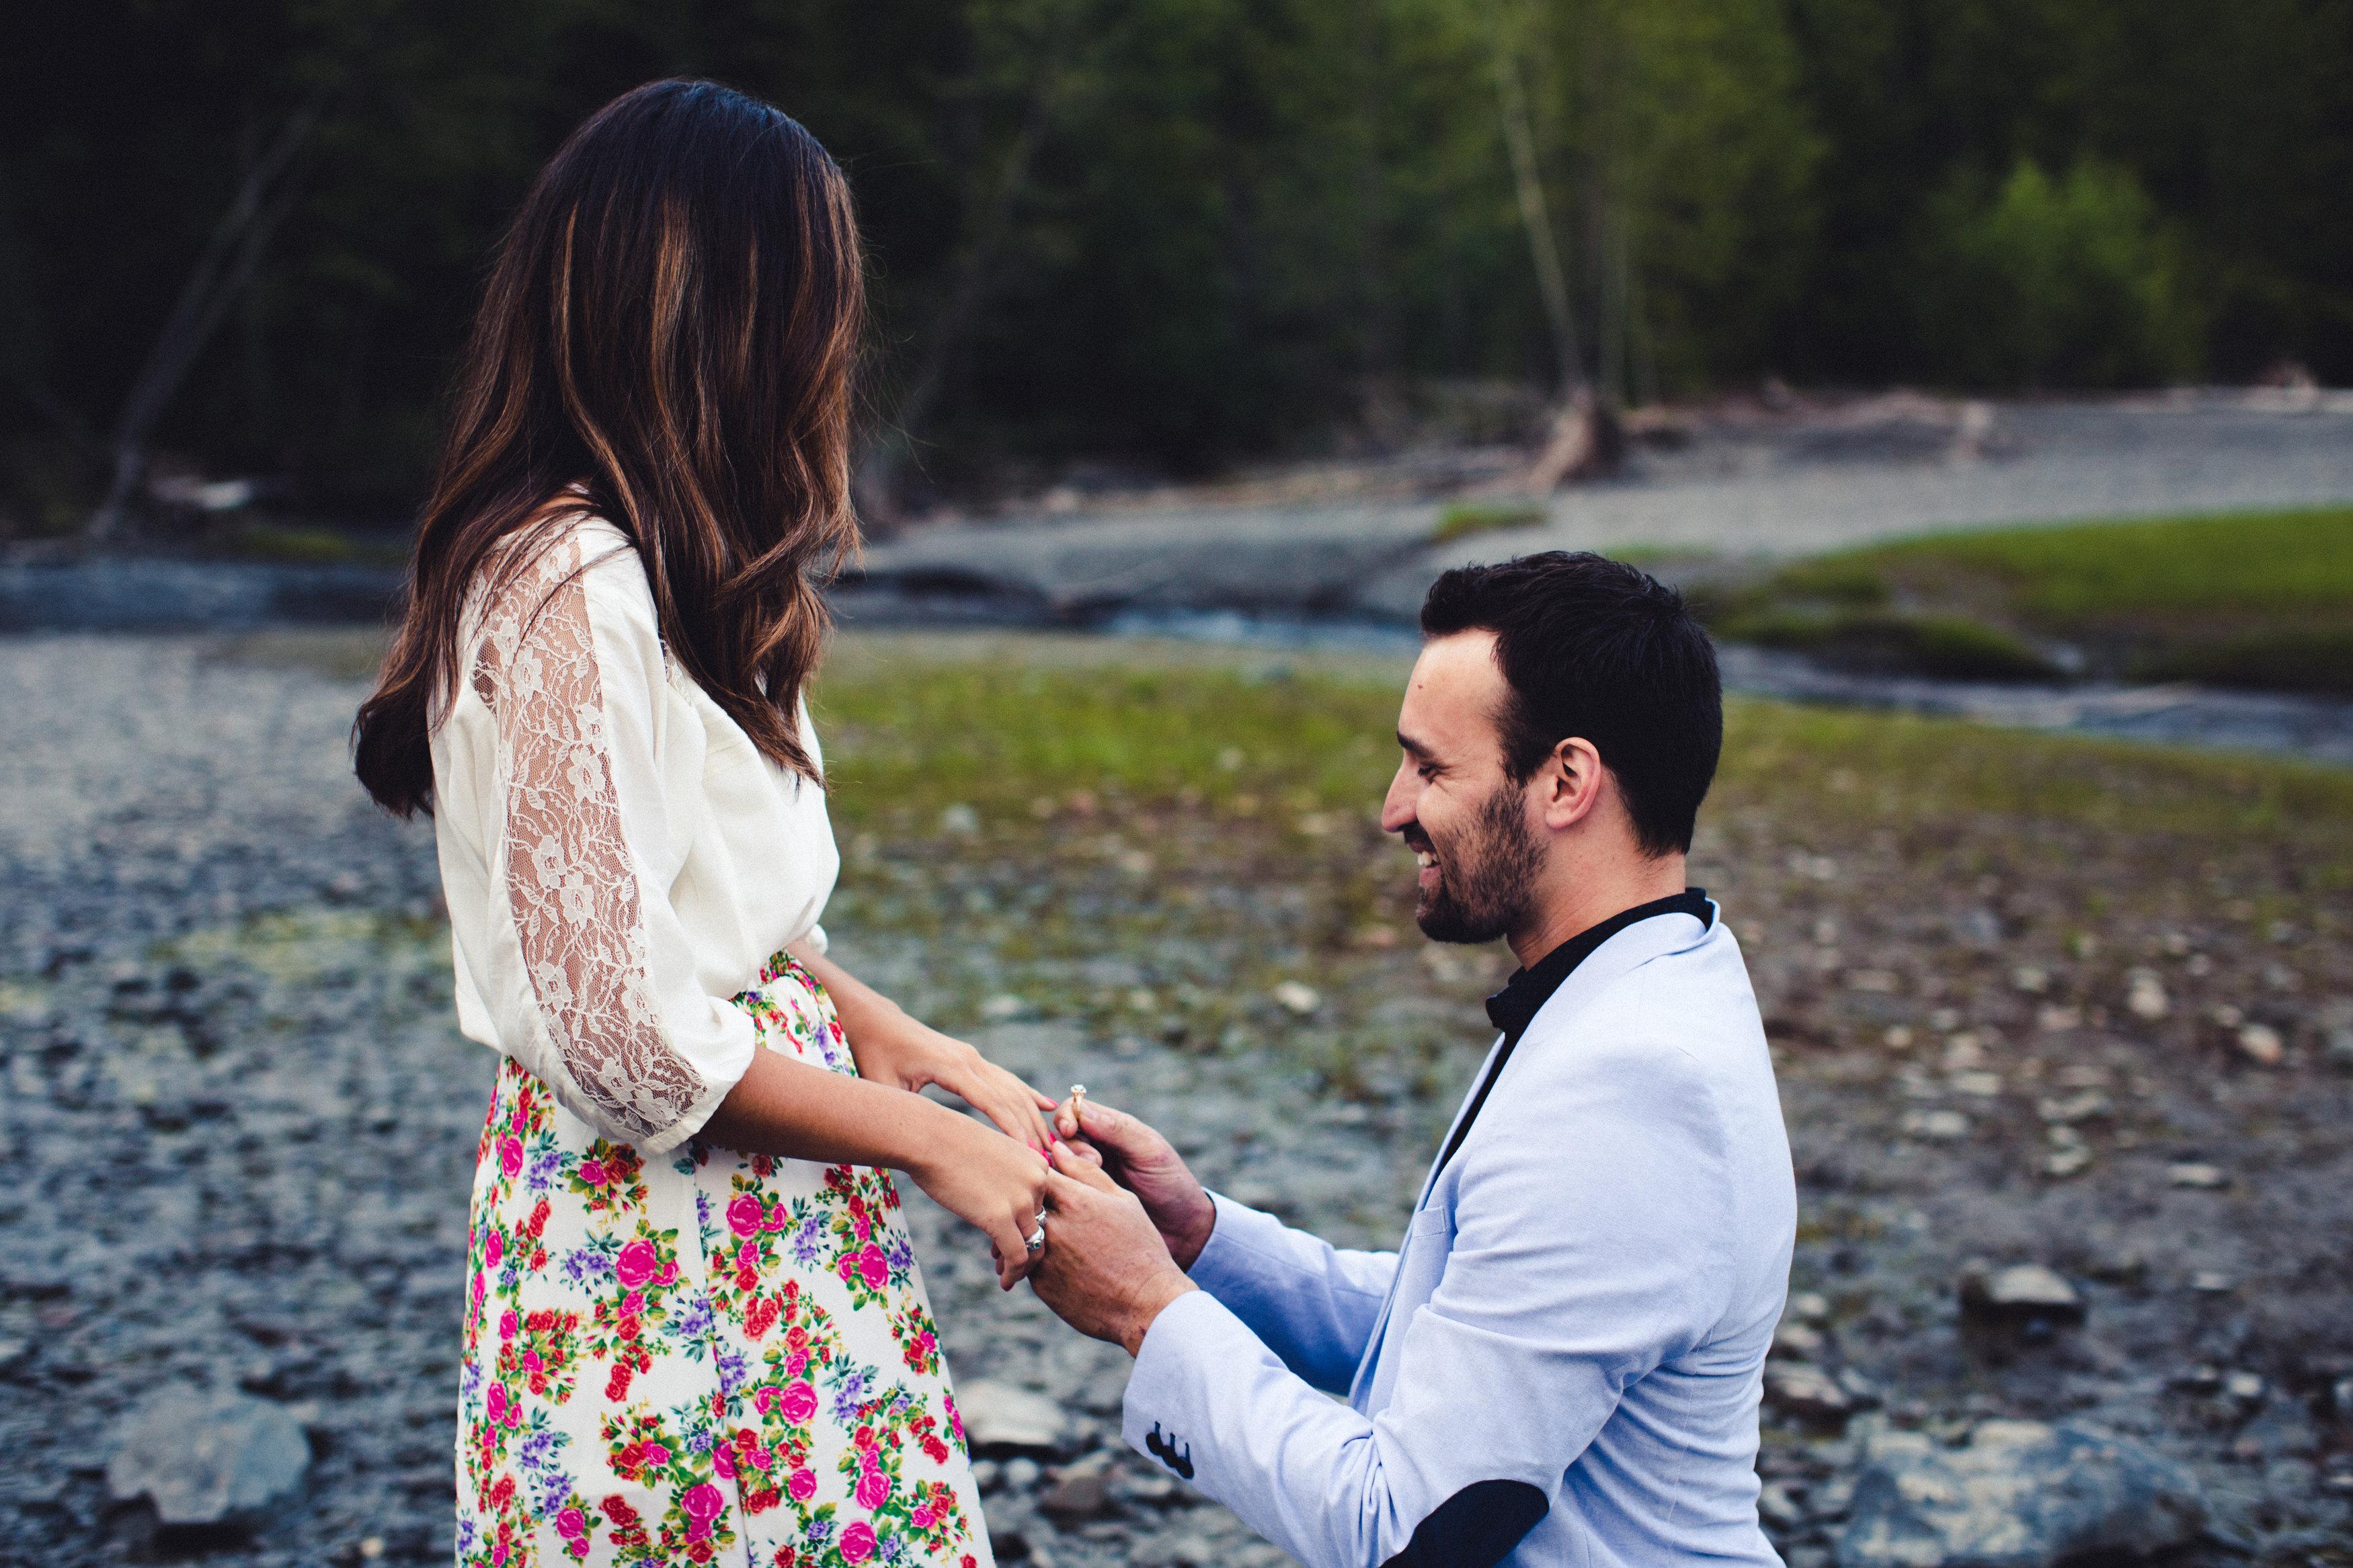 Image 4 of Rebeca and Josh's Beautiful Proposal in Alaska